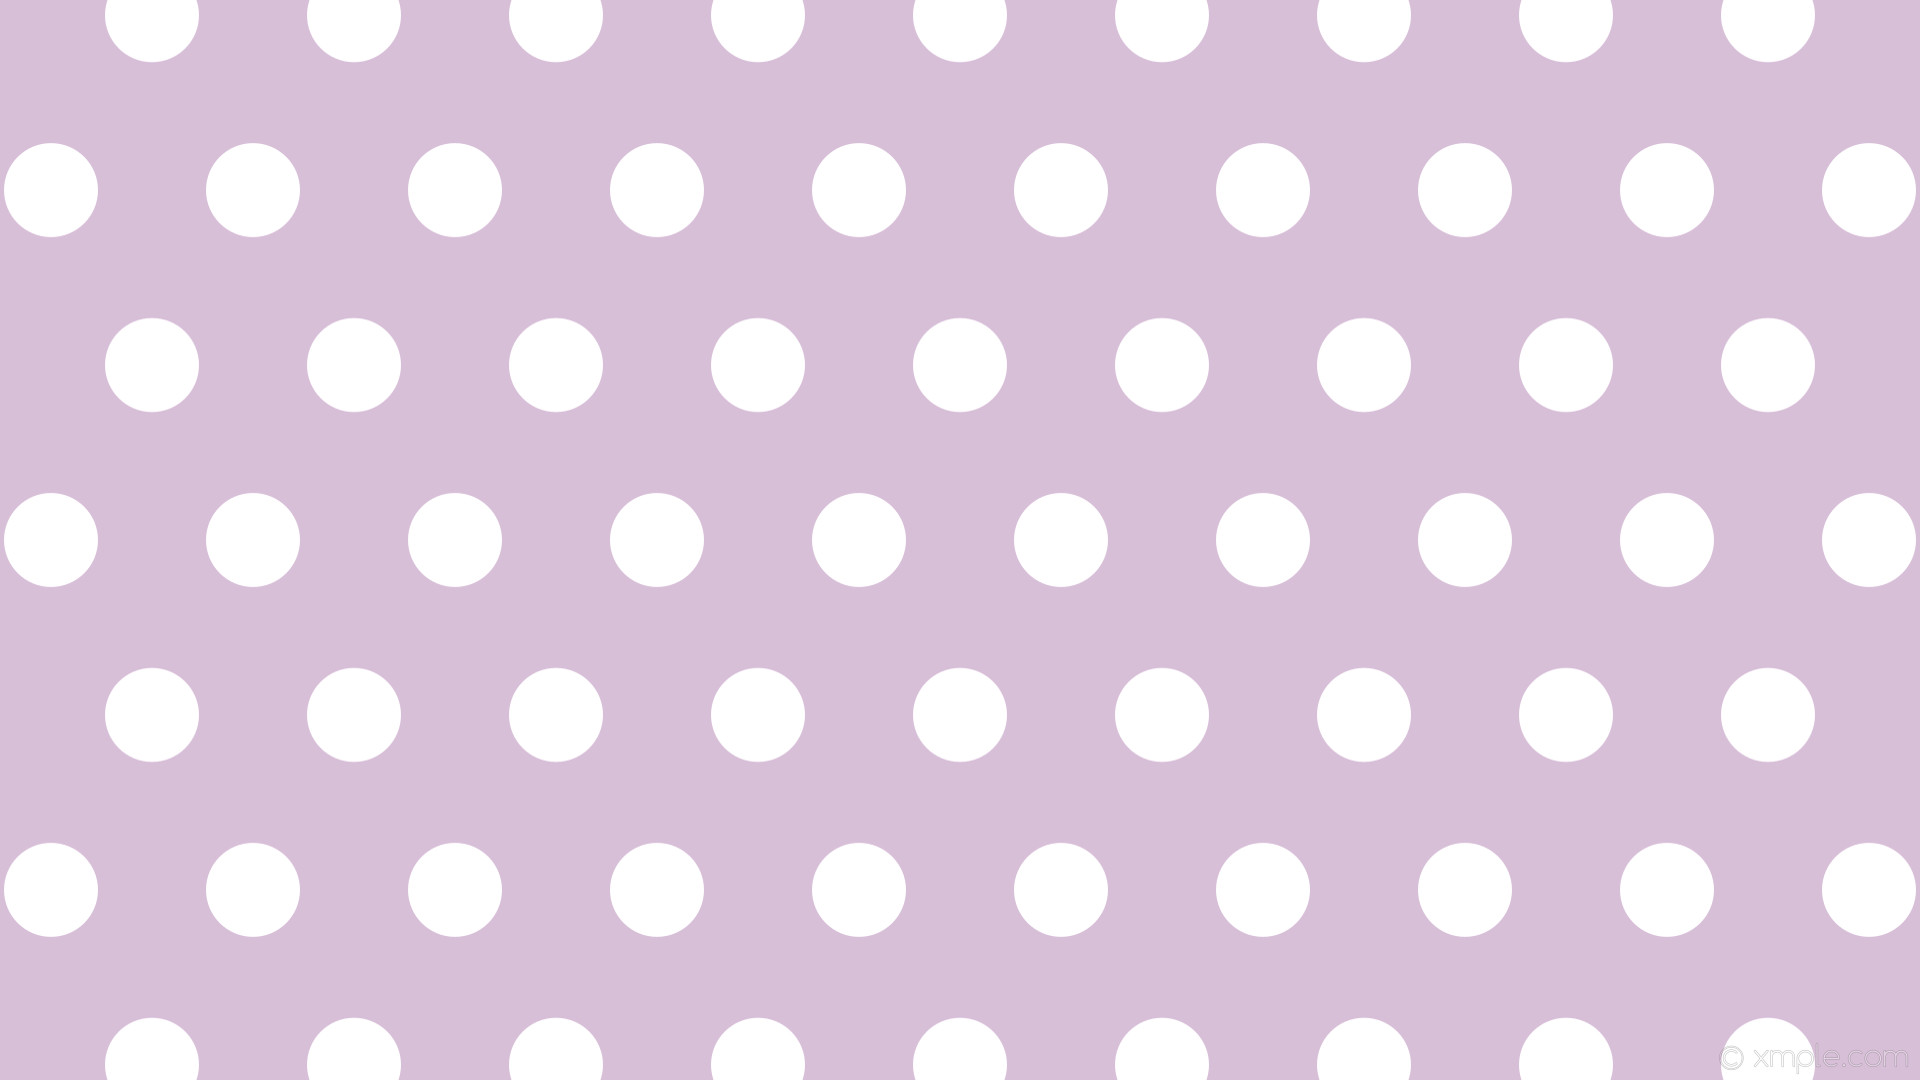 wallpaper white purple hexagon polka dots thistle #d8bfd8 #ffffff 0° 94px  202px